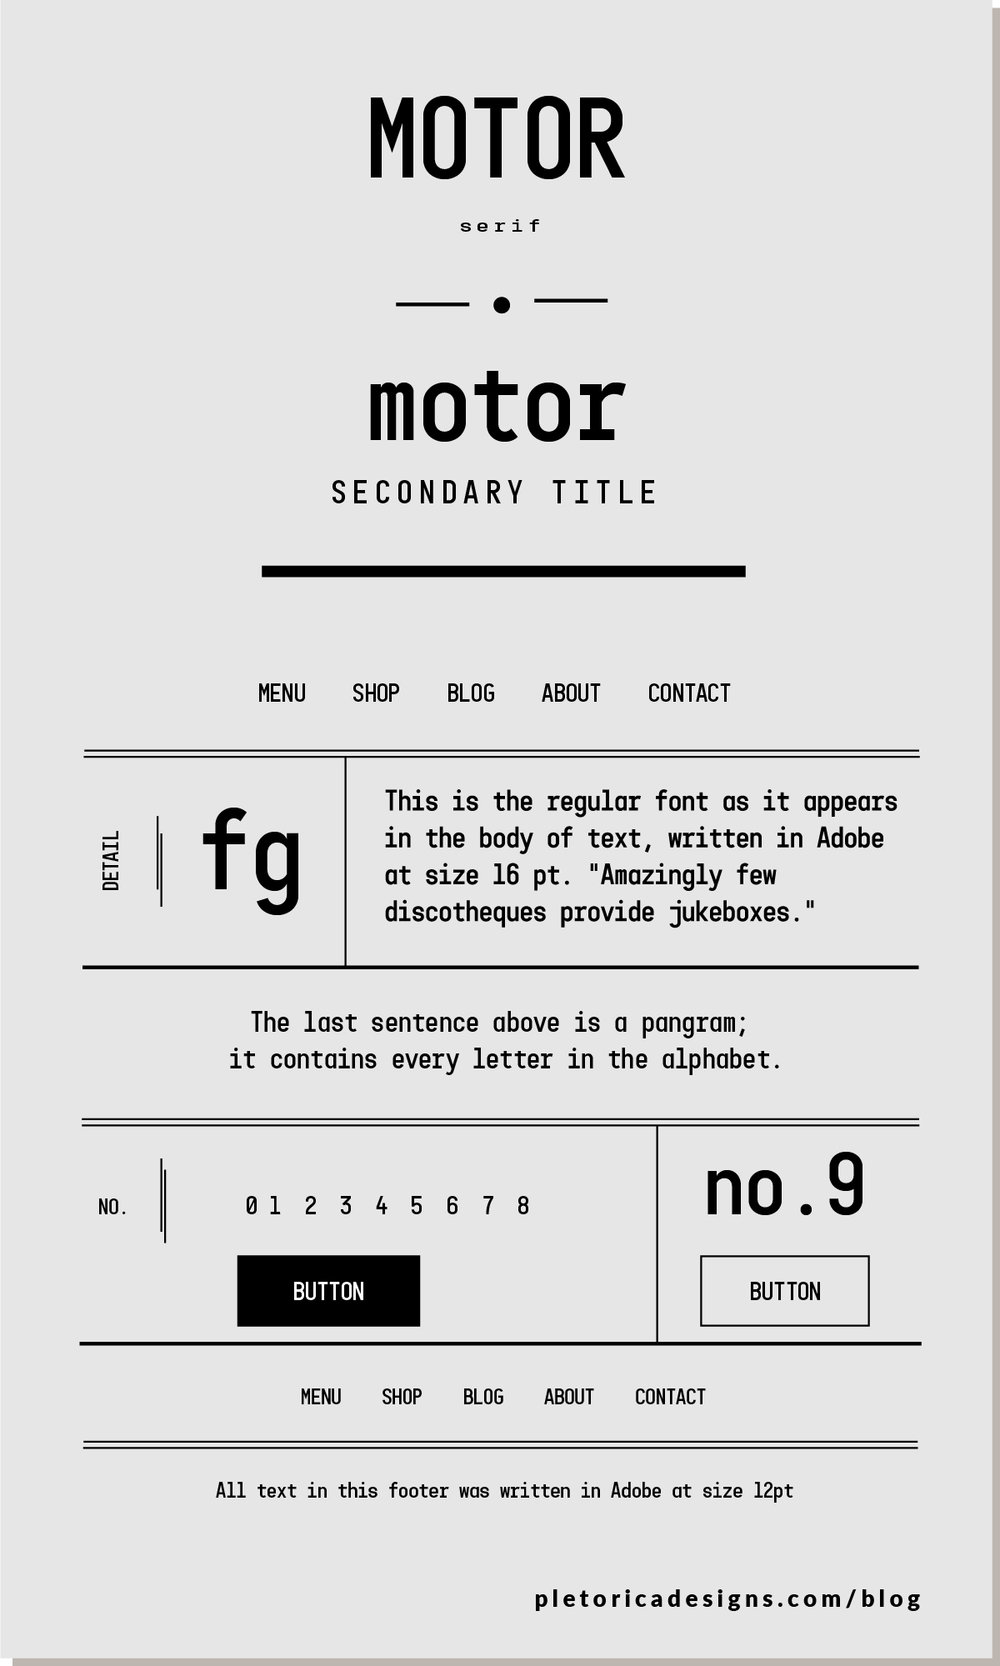 LET'S TYPE: Motor — PLETÓRICA DESIGNS